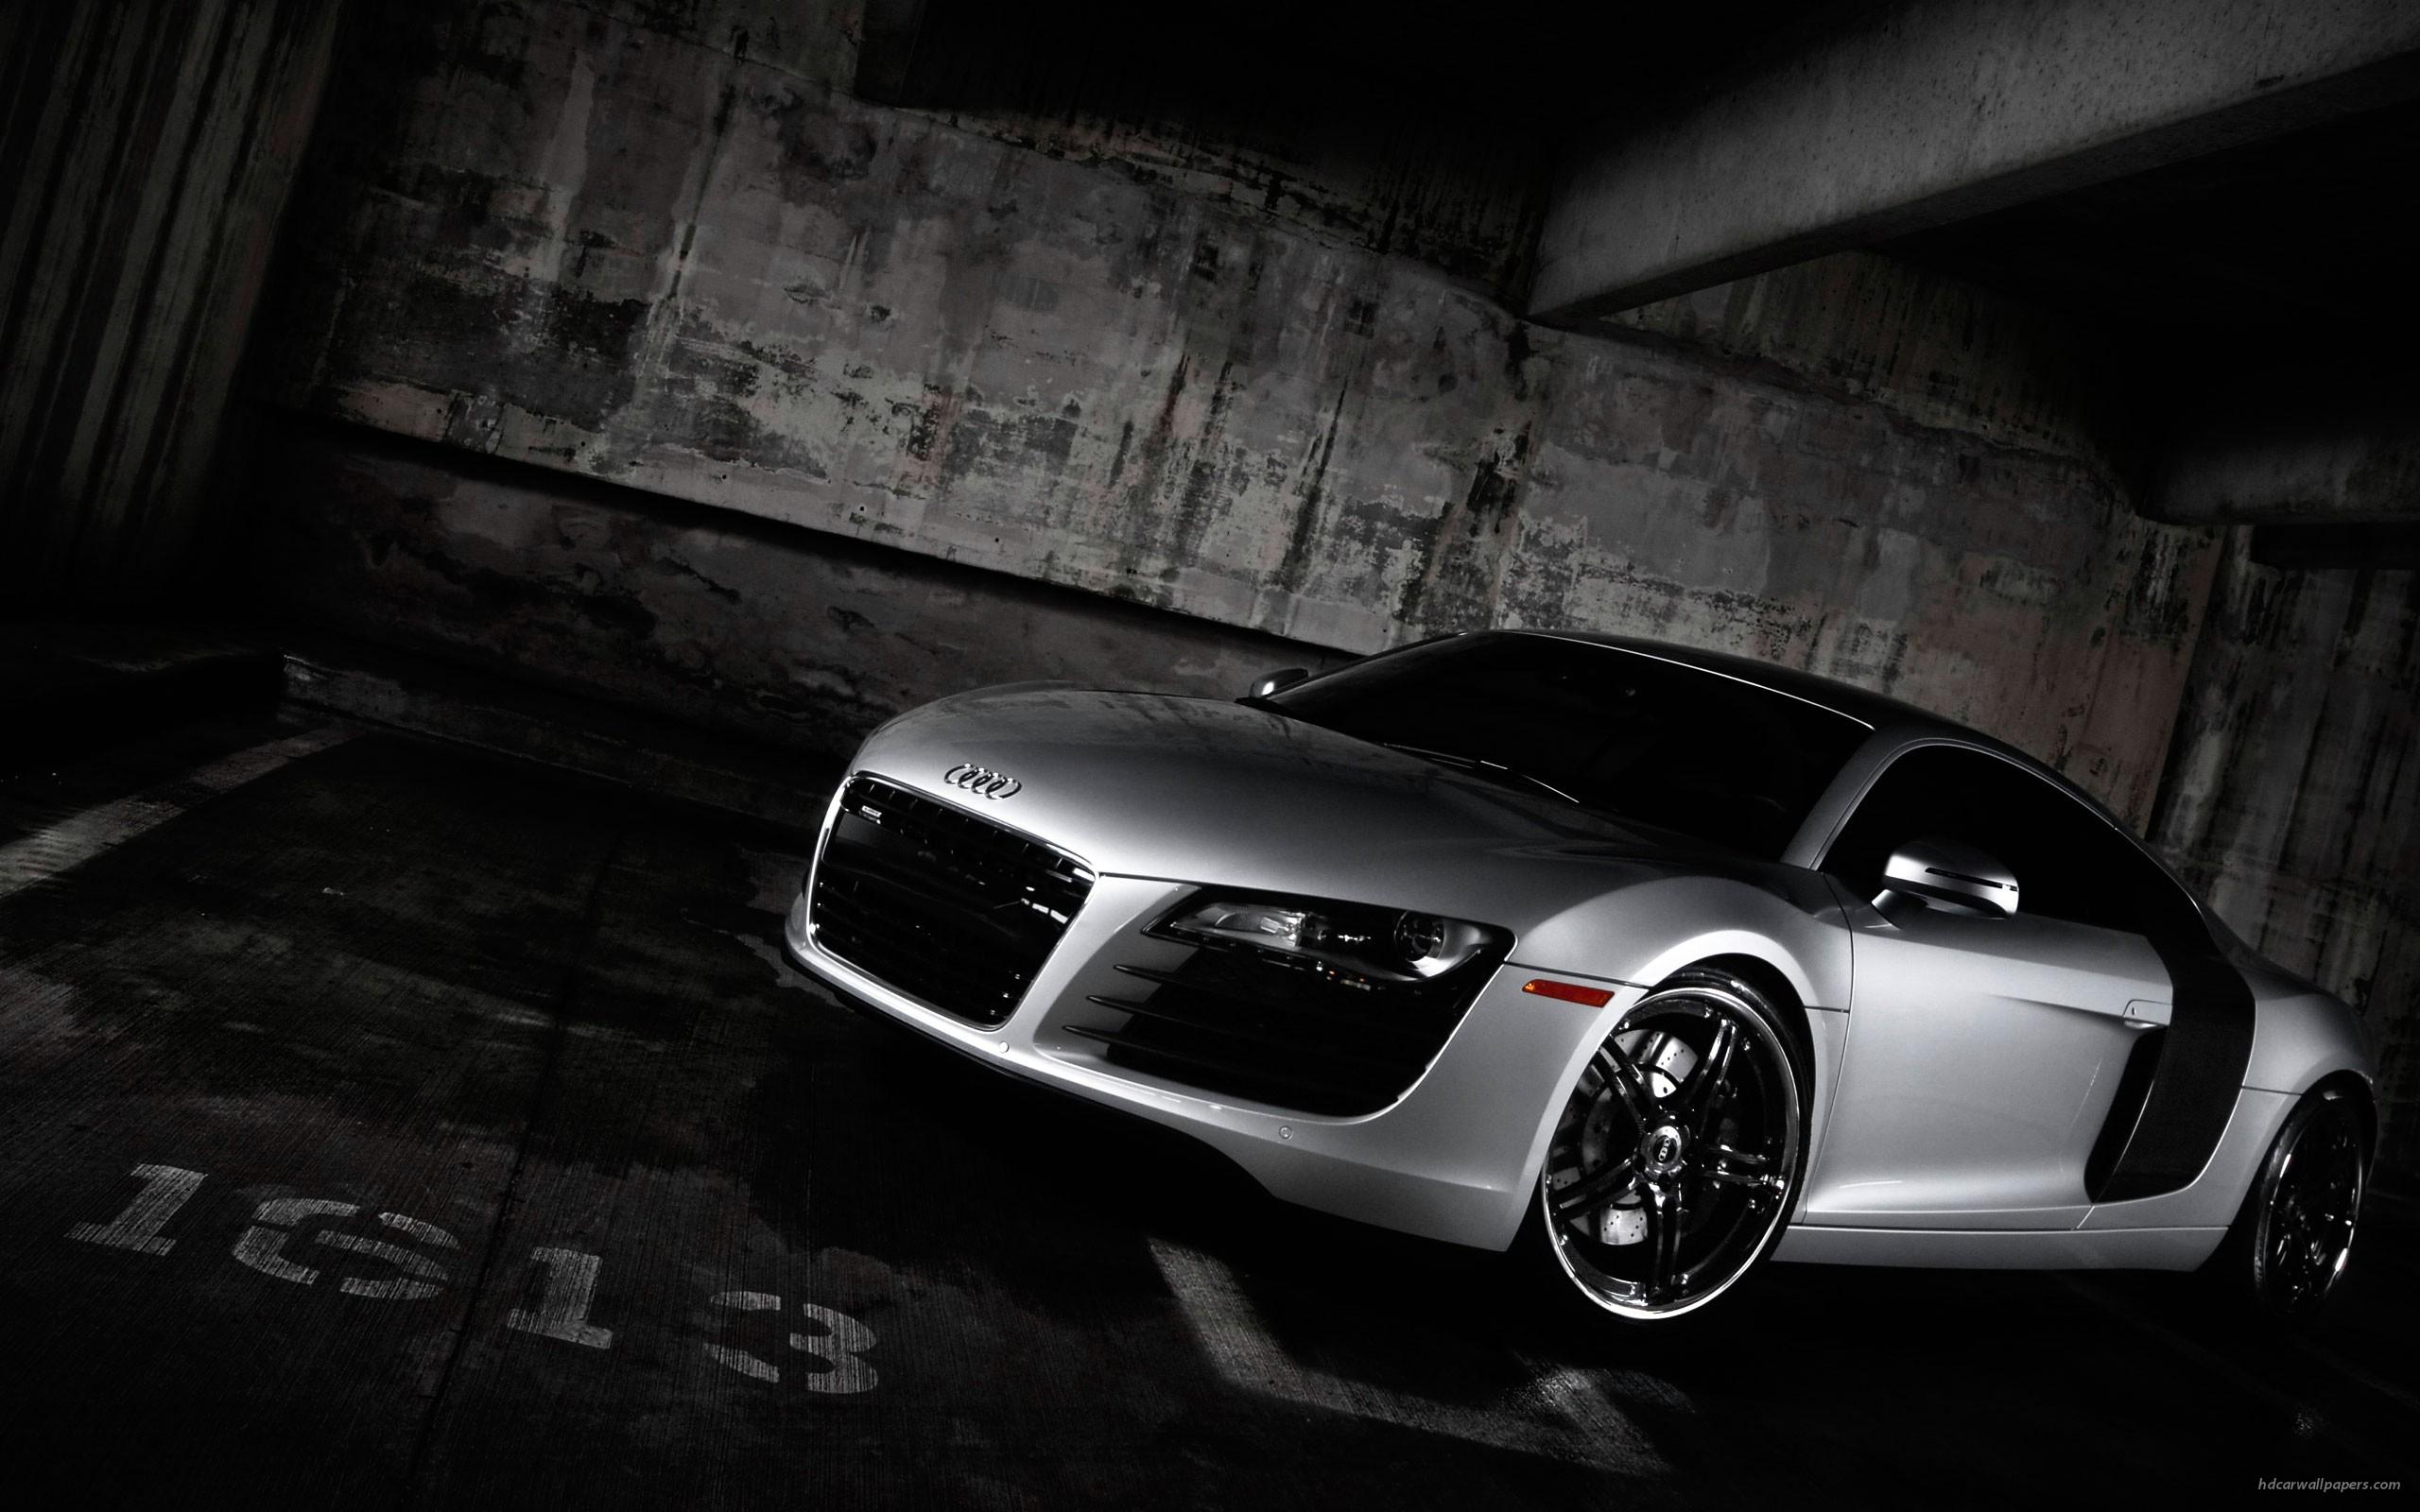 Audi R8 HD Widescreen